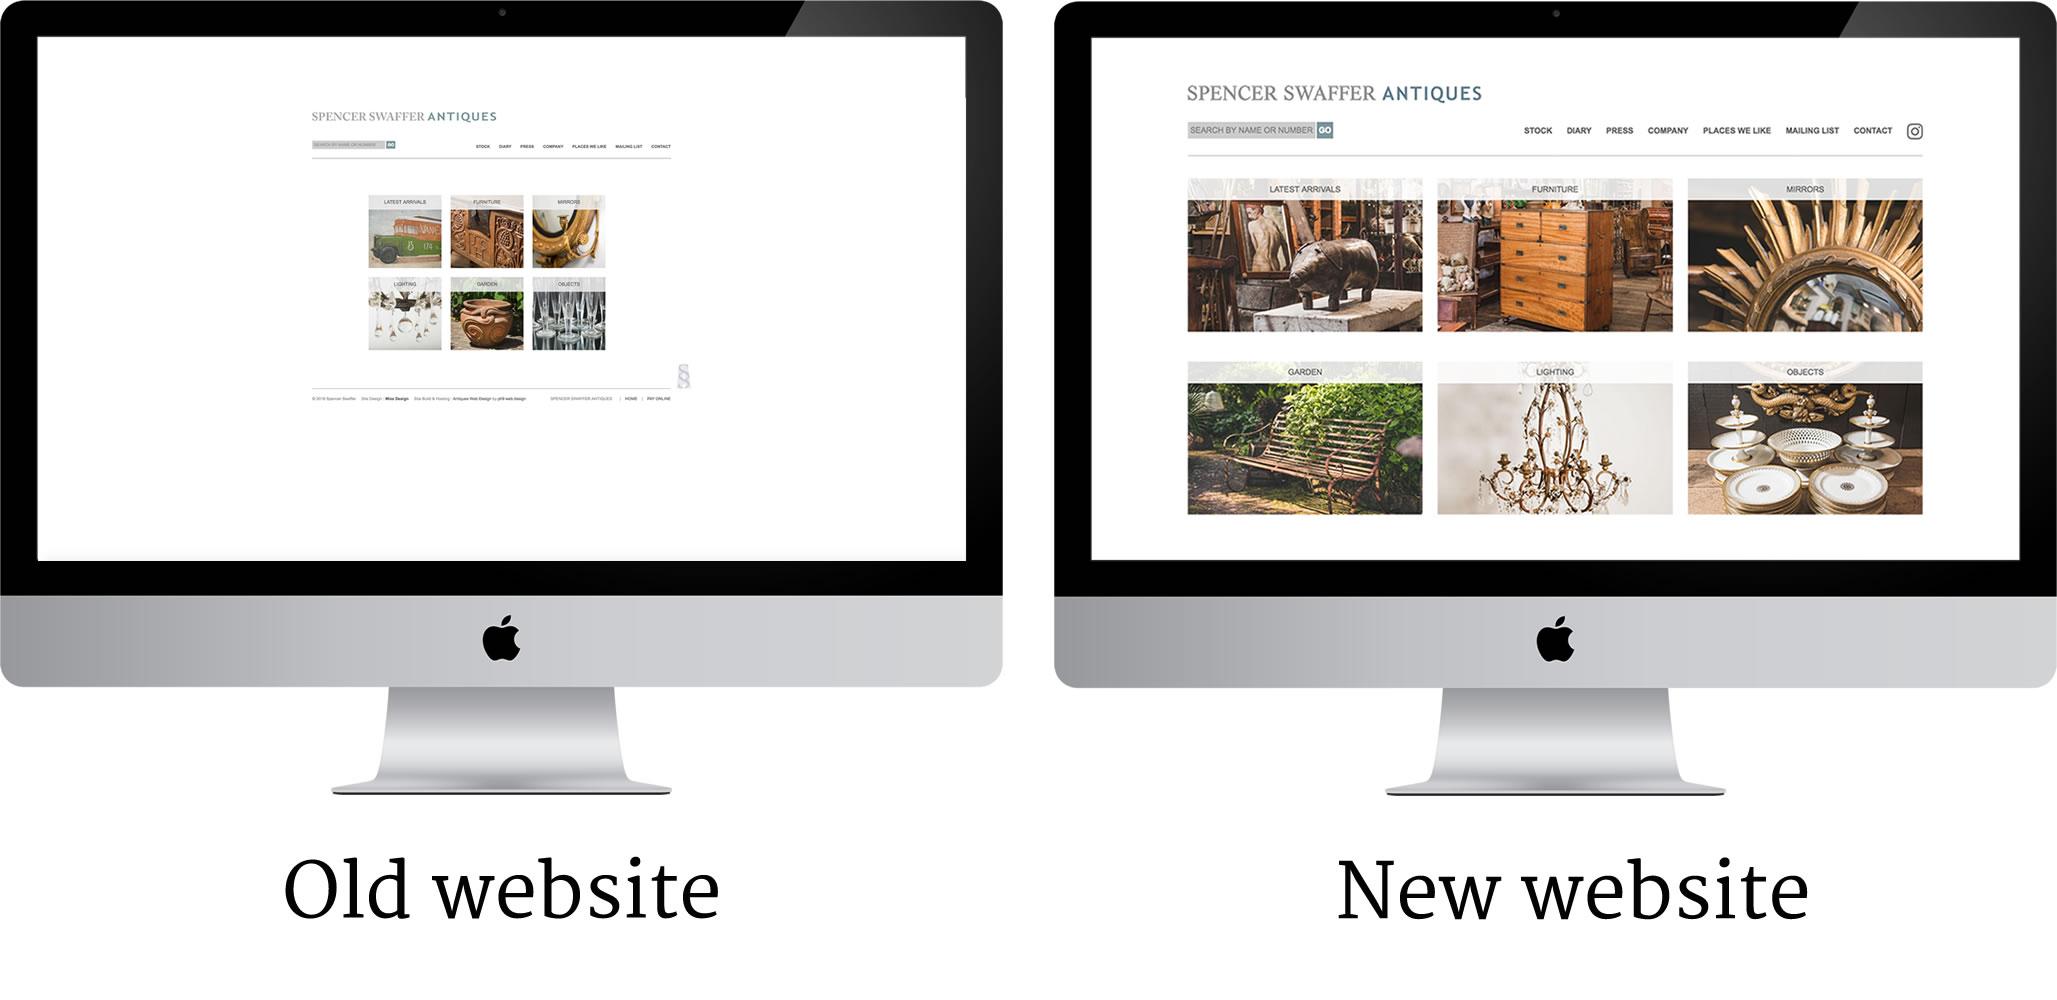 Antiques Web Site Design - Better on bigger screens